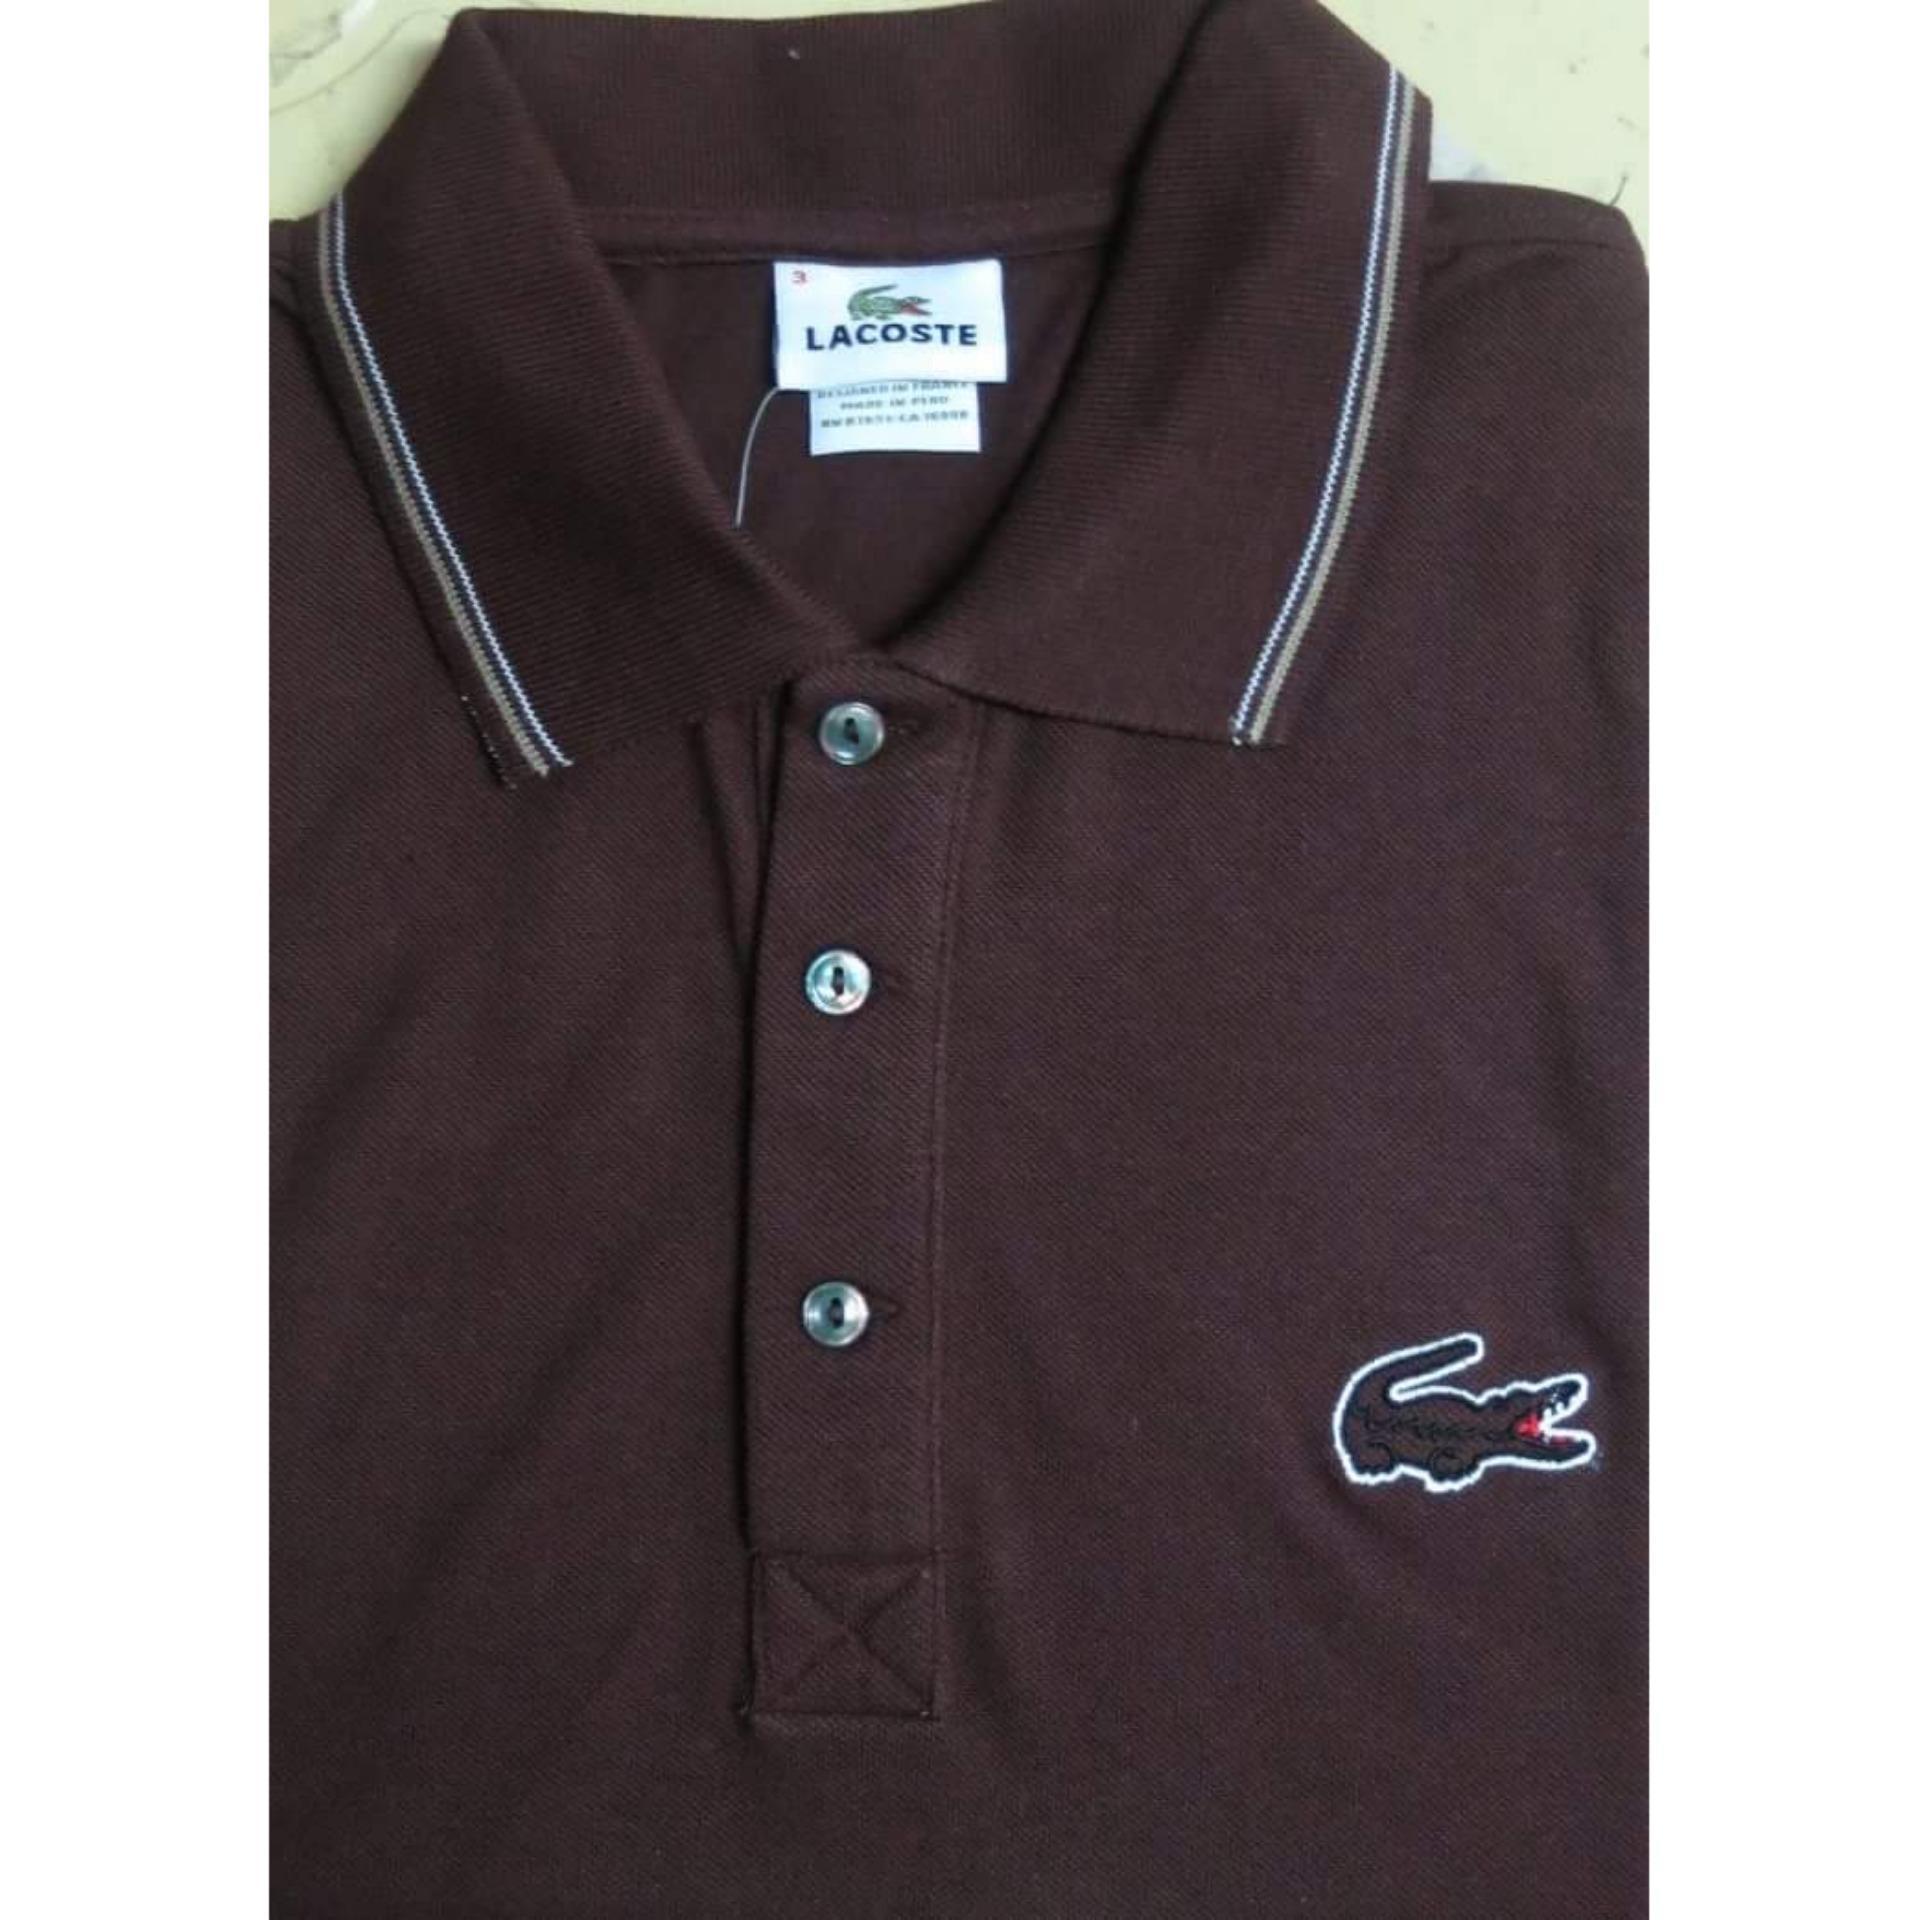 Lacoste Shirts Lacoste Sale Sale Polo Shirts Philippines Polo Lacoste Philippines 6ybf7g